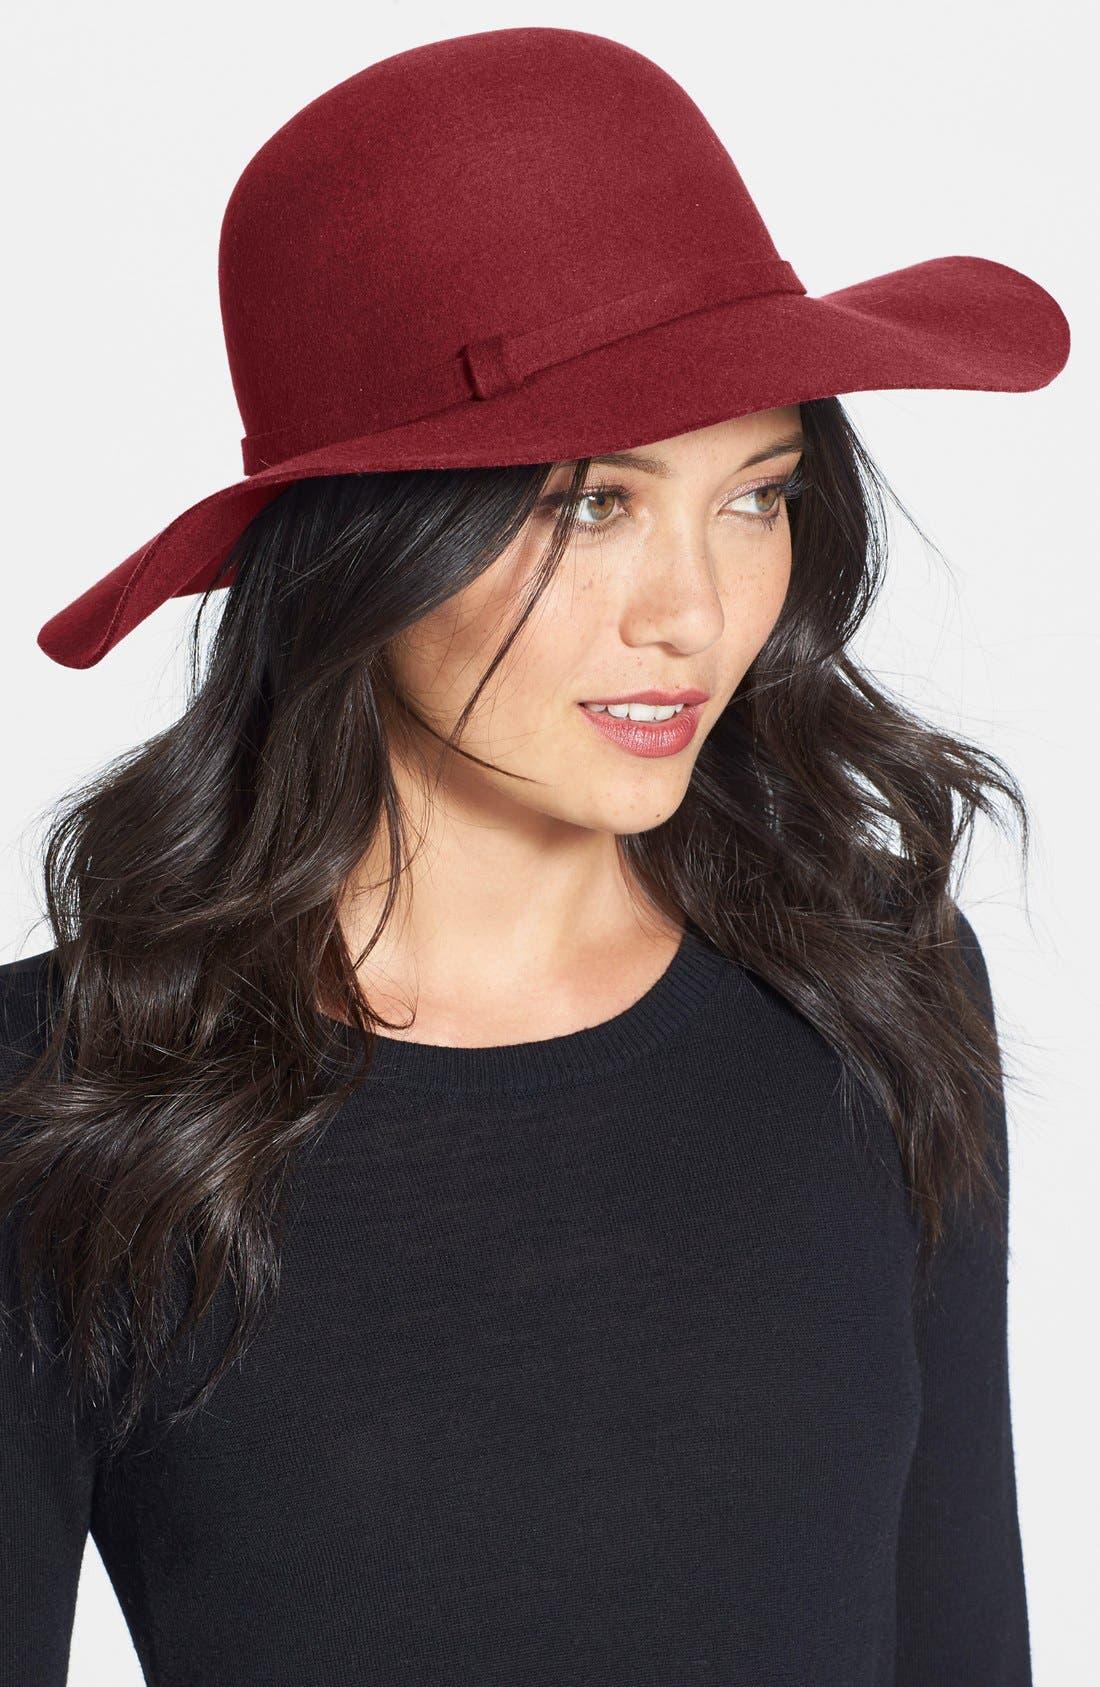 Alternate Image 1 Selected - Phase 3 Floppy Wool Hat